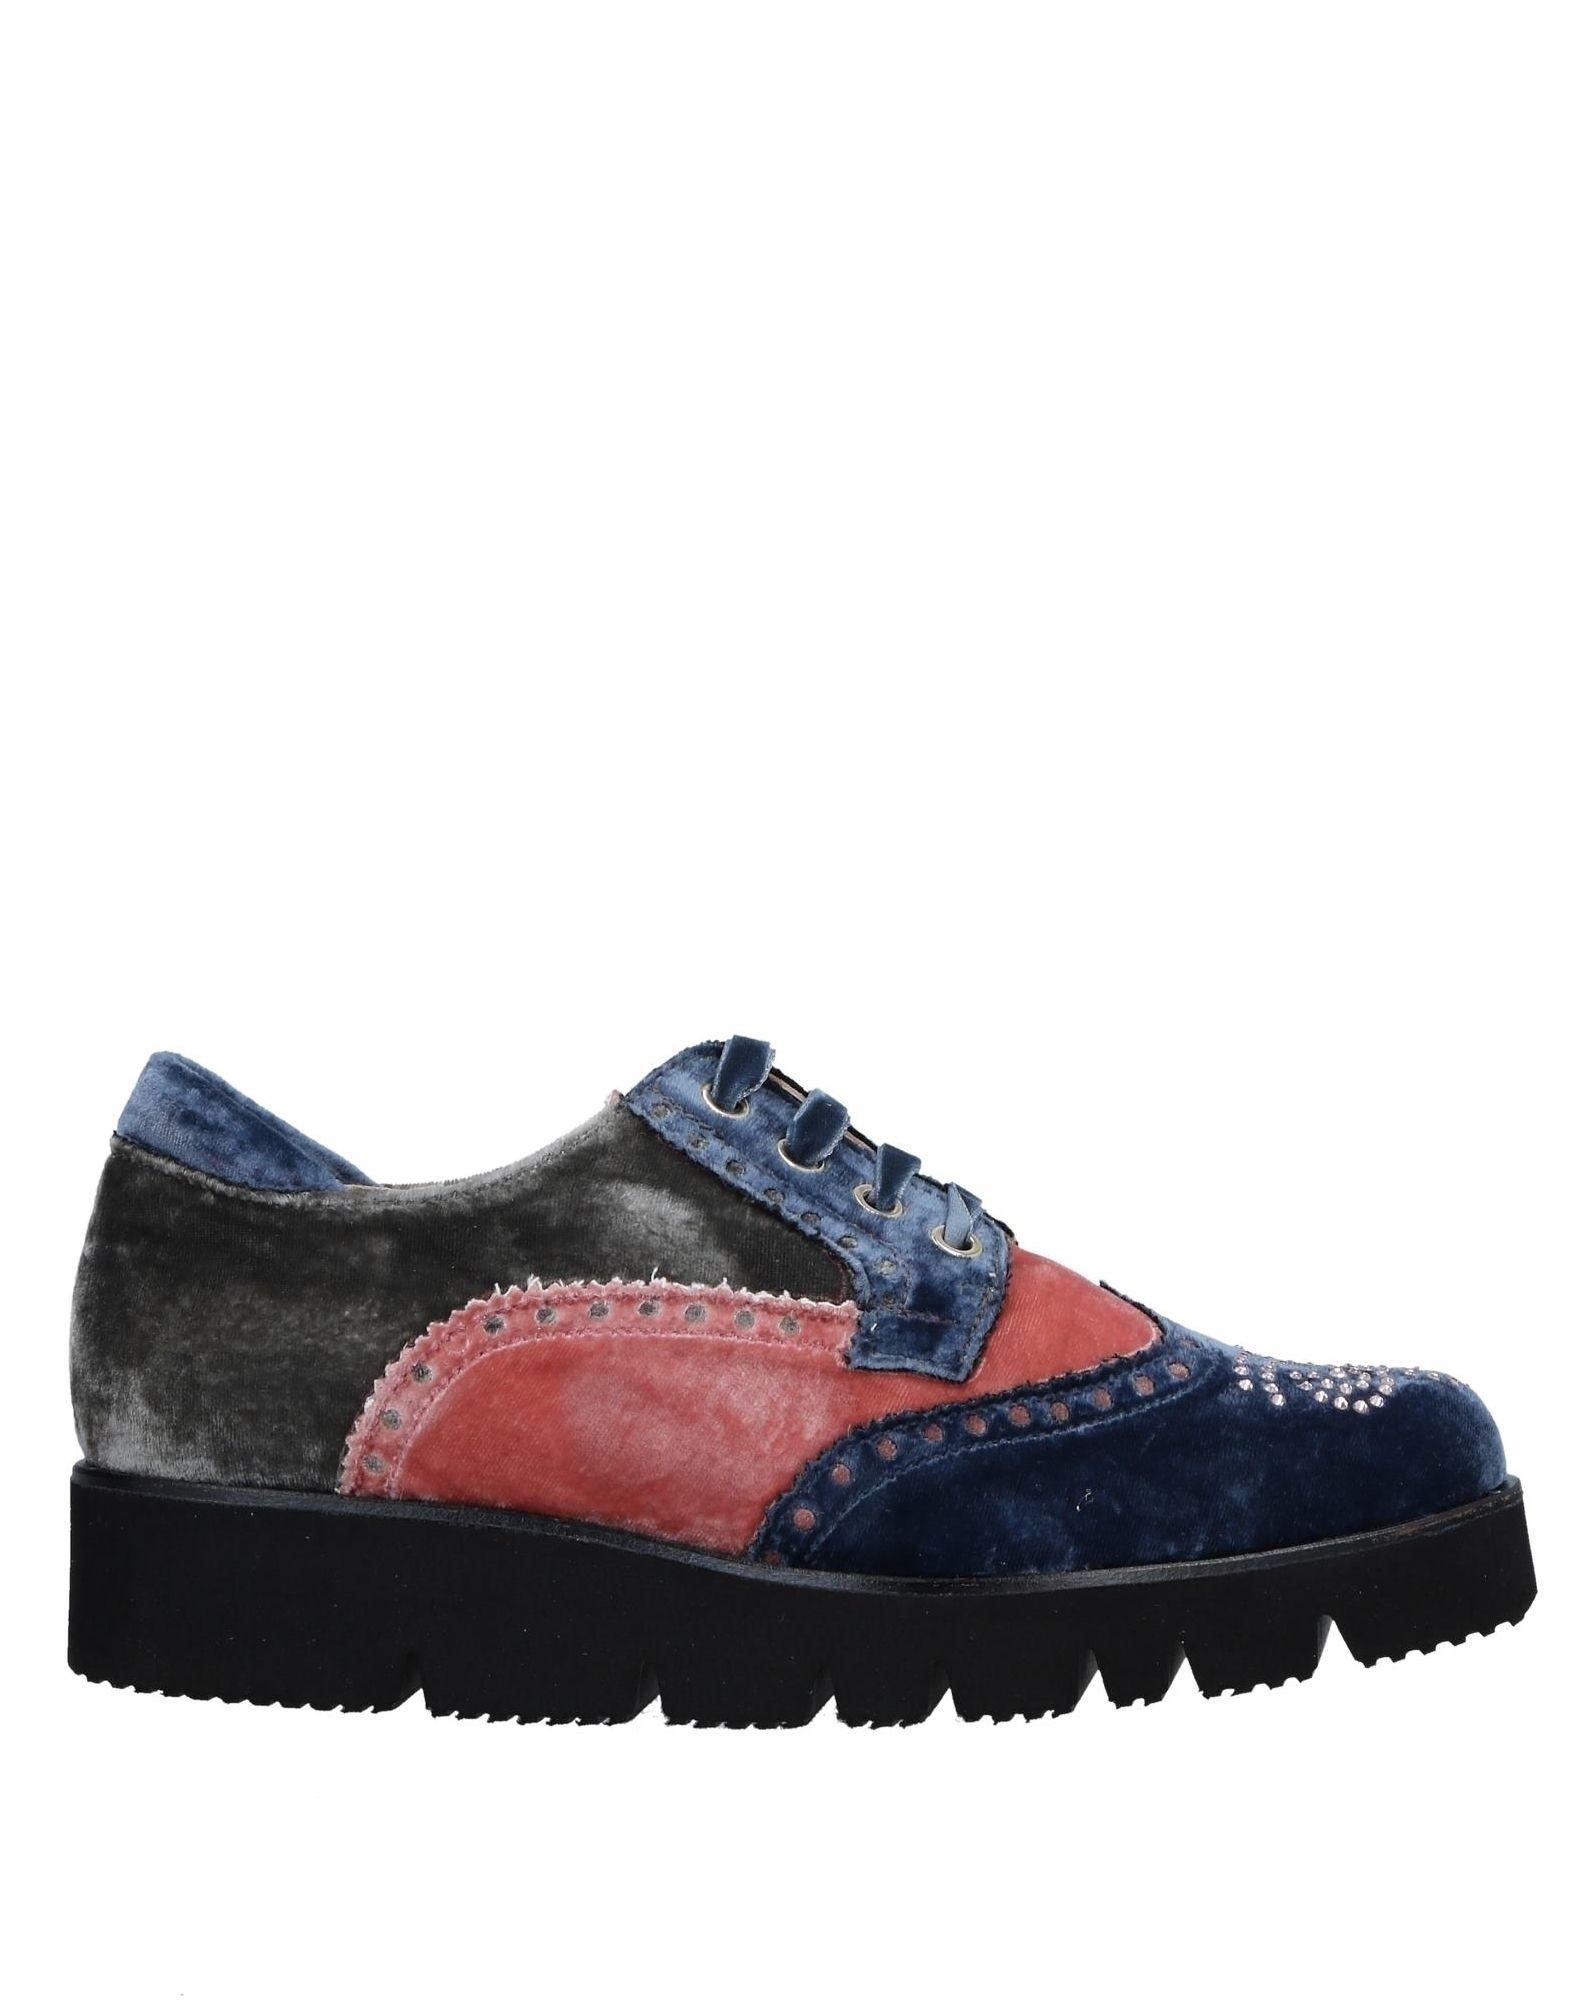 RUTH AMAYA Обувь на шнурках ruth